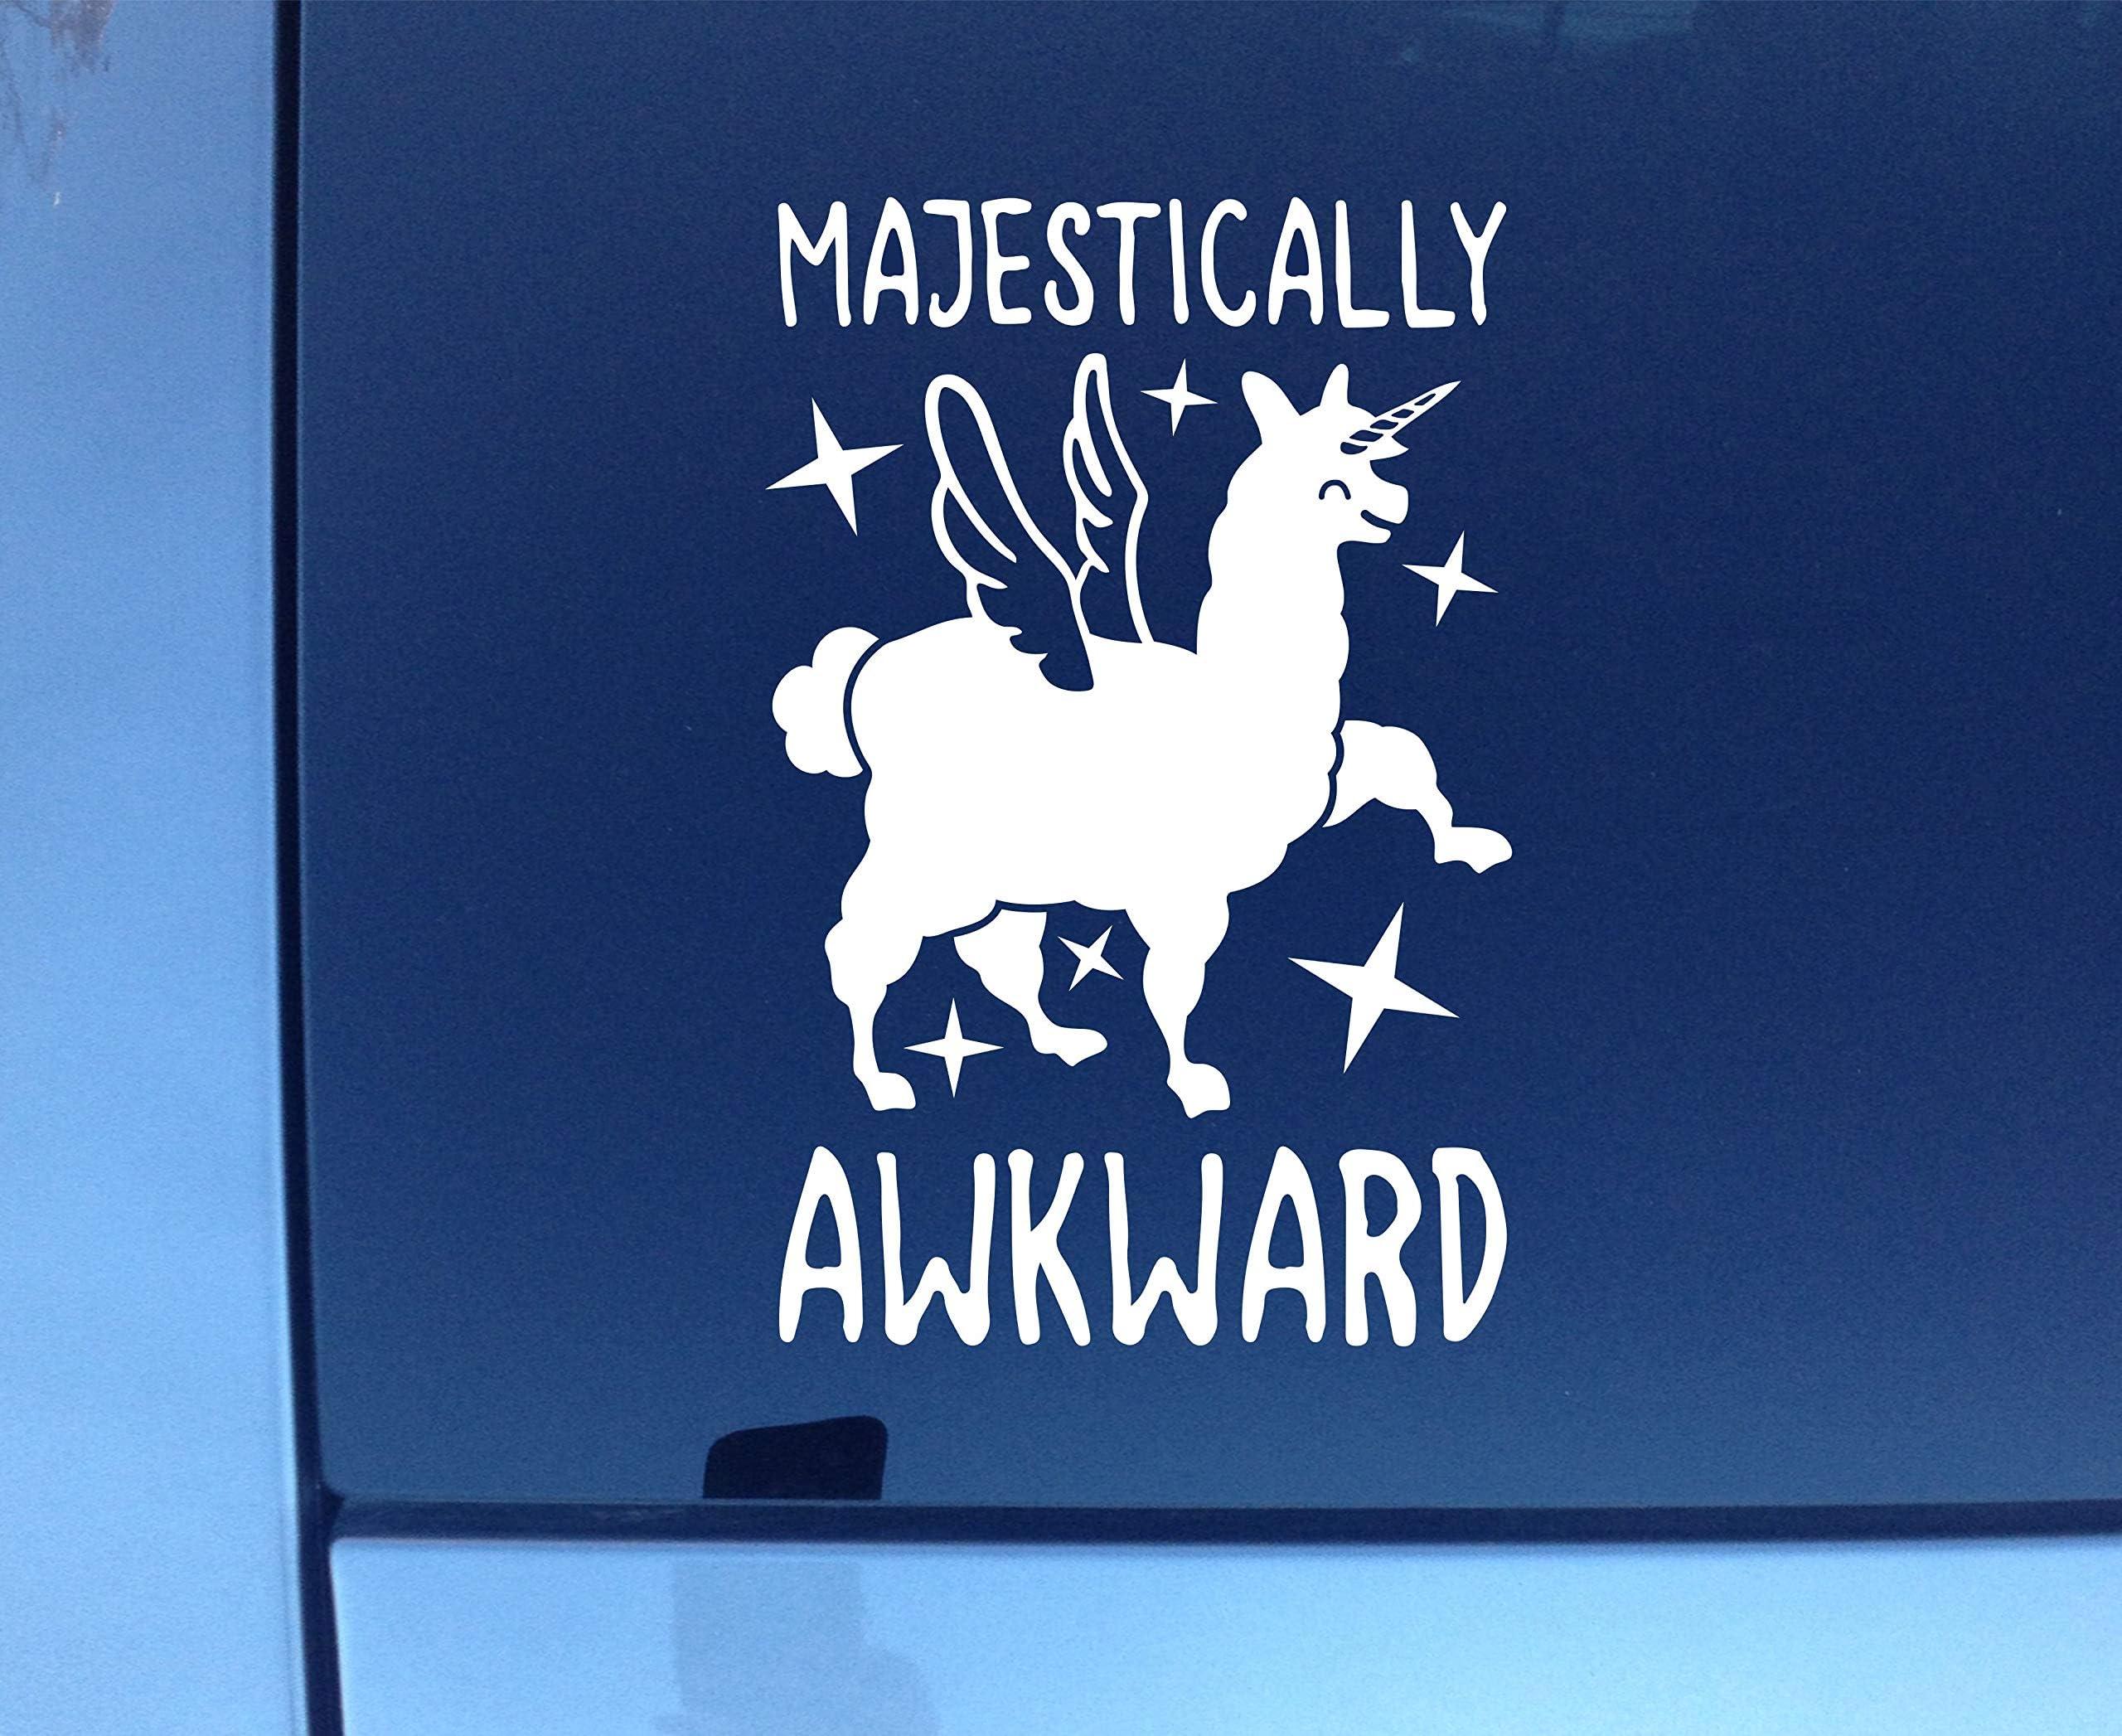 Majestically Awkward Magical Badger Sticker